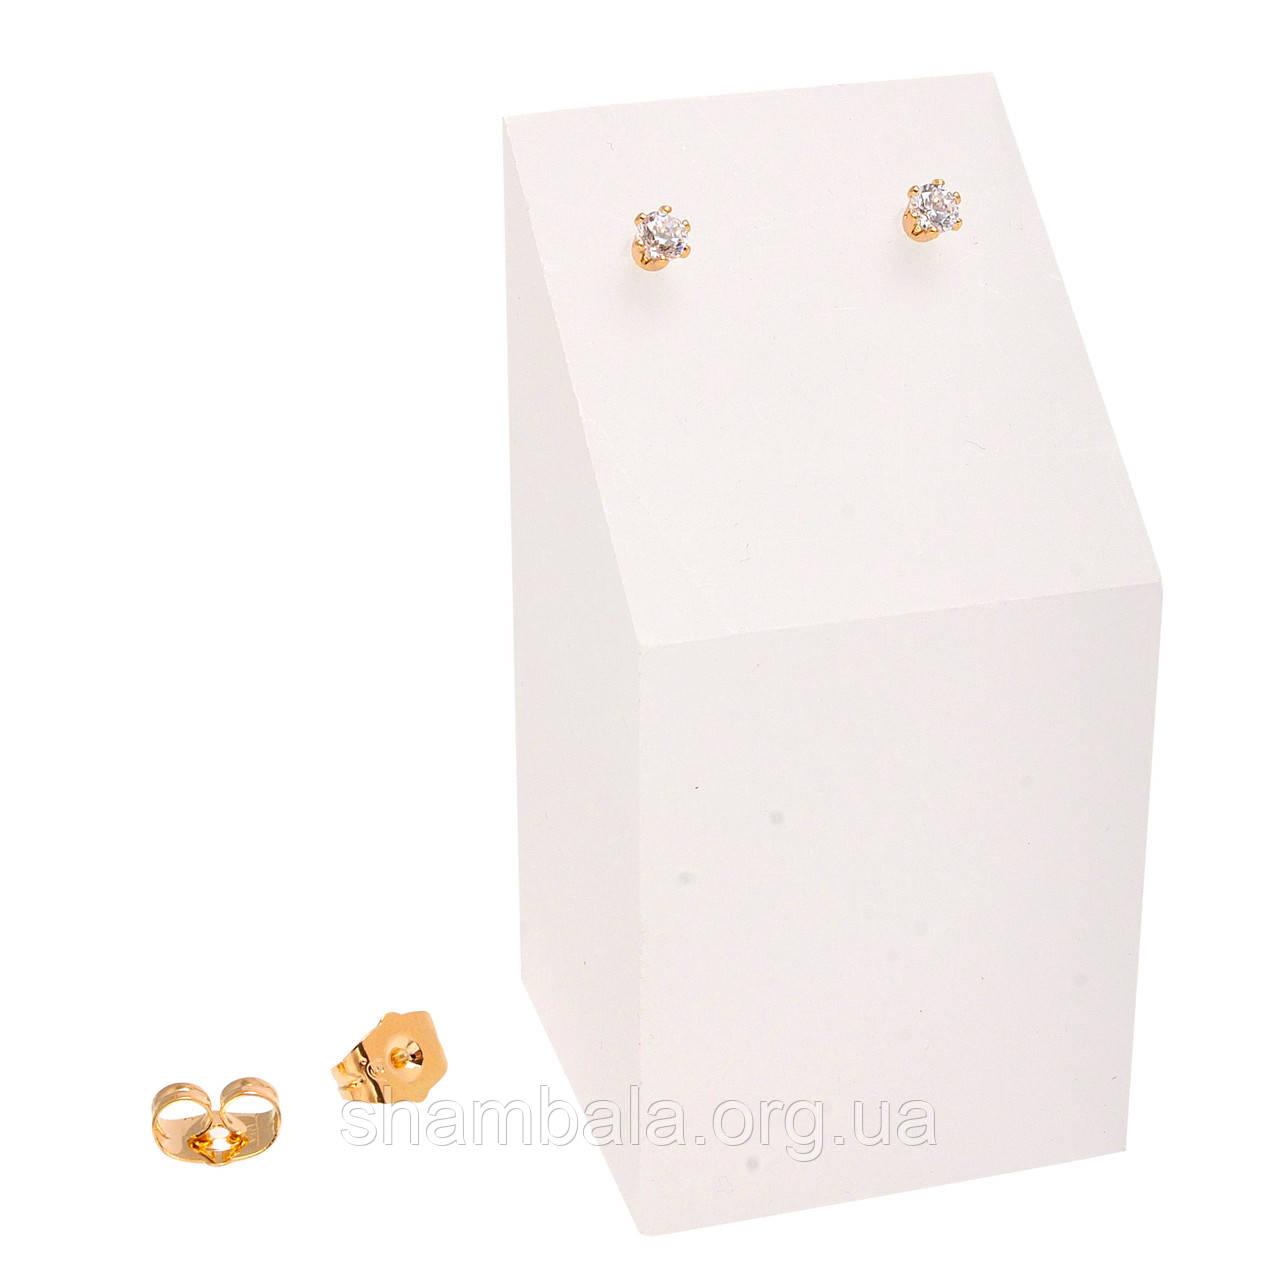 "Серьги Xuping Jewelry ""Rock"" позолота (045115)"